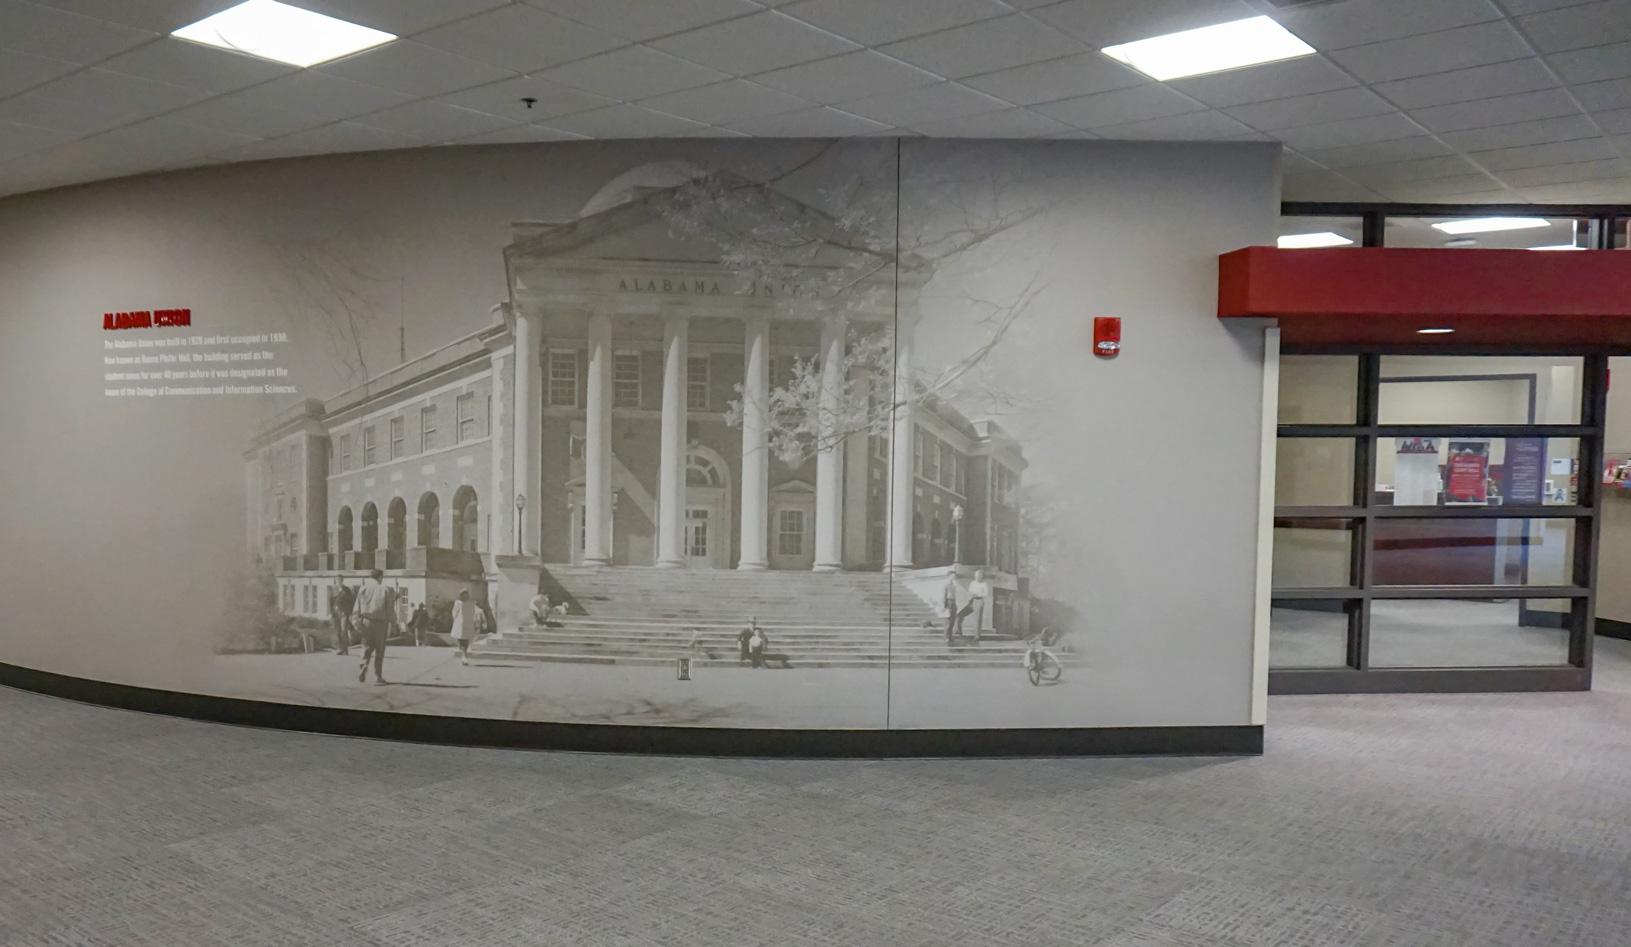 Alabama Union wall graphic in Ferguson Hall